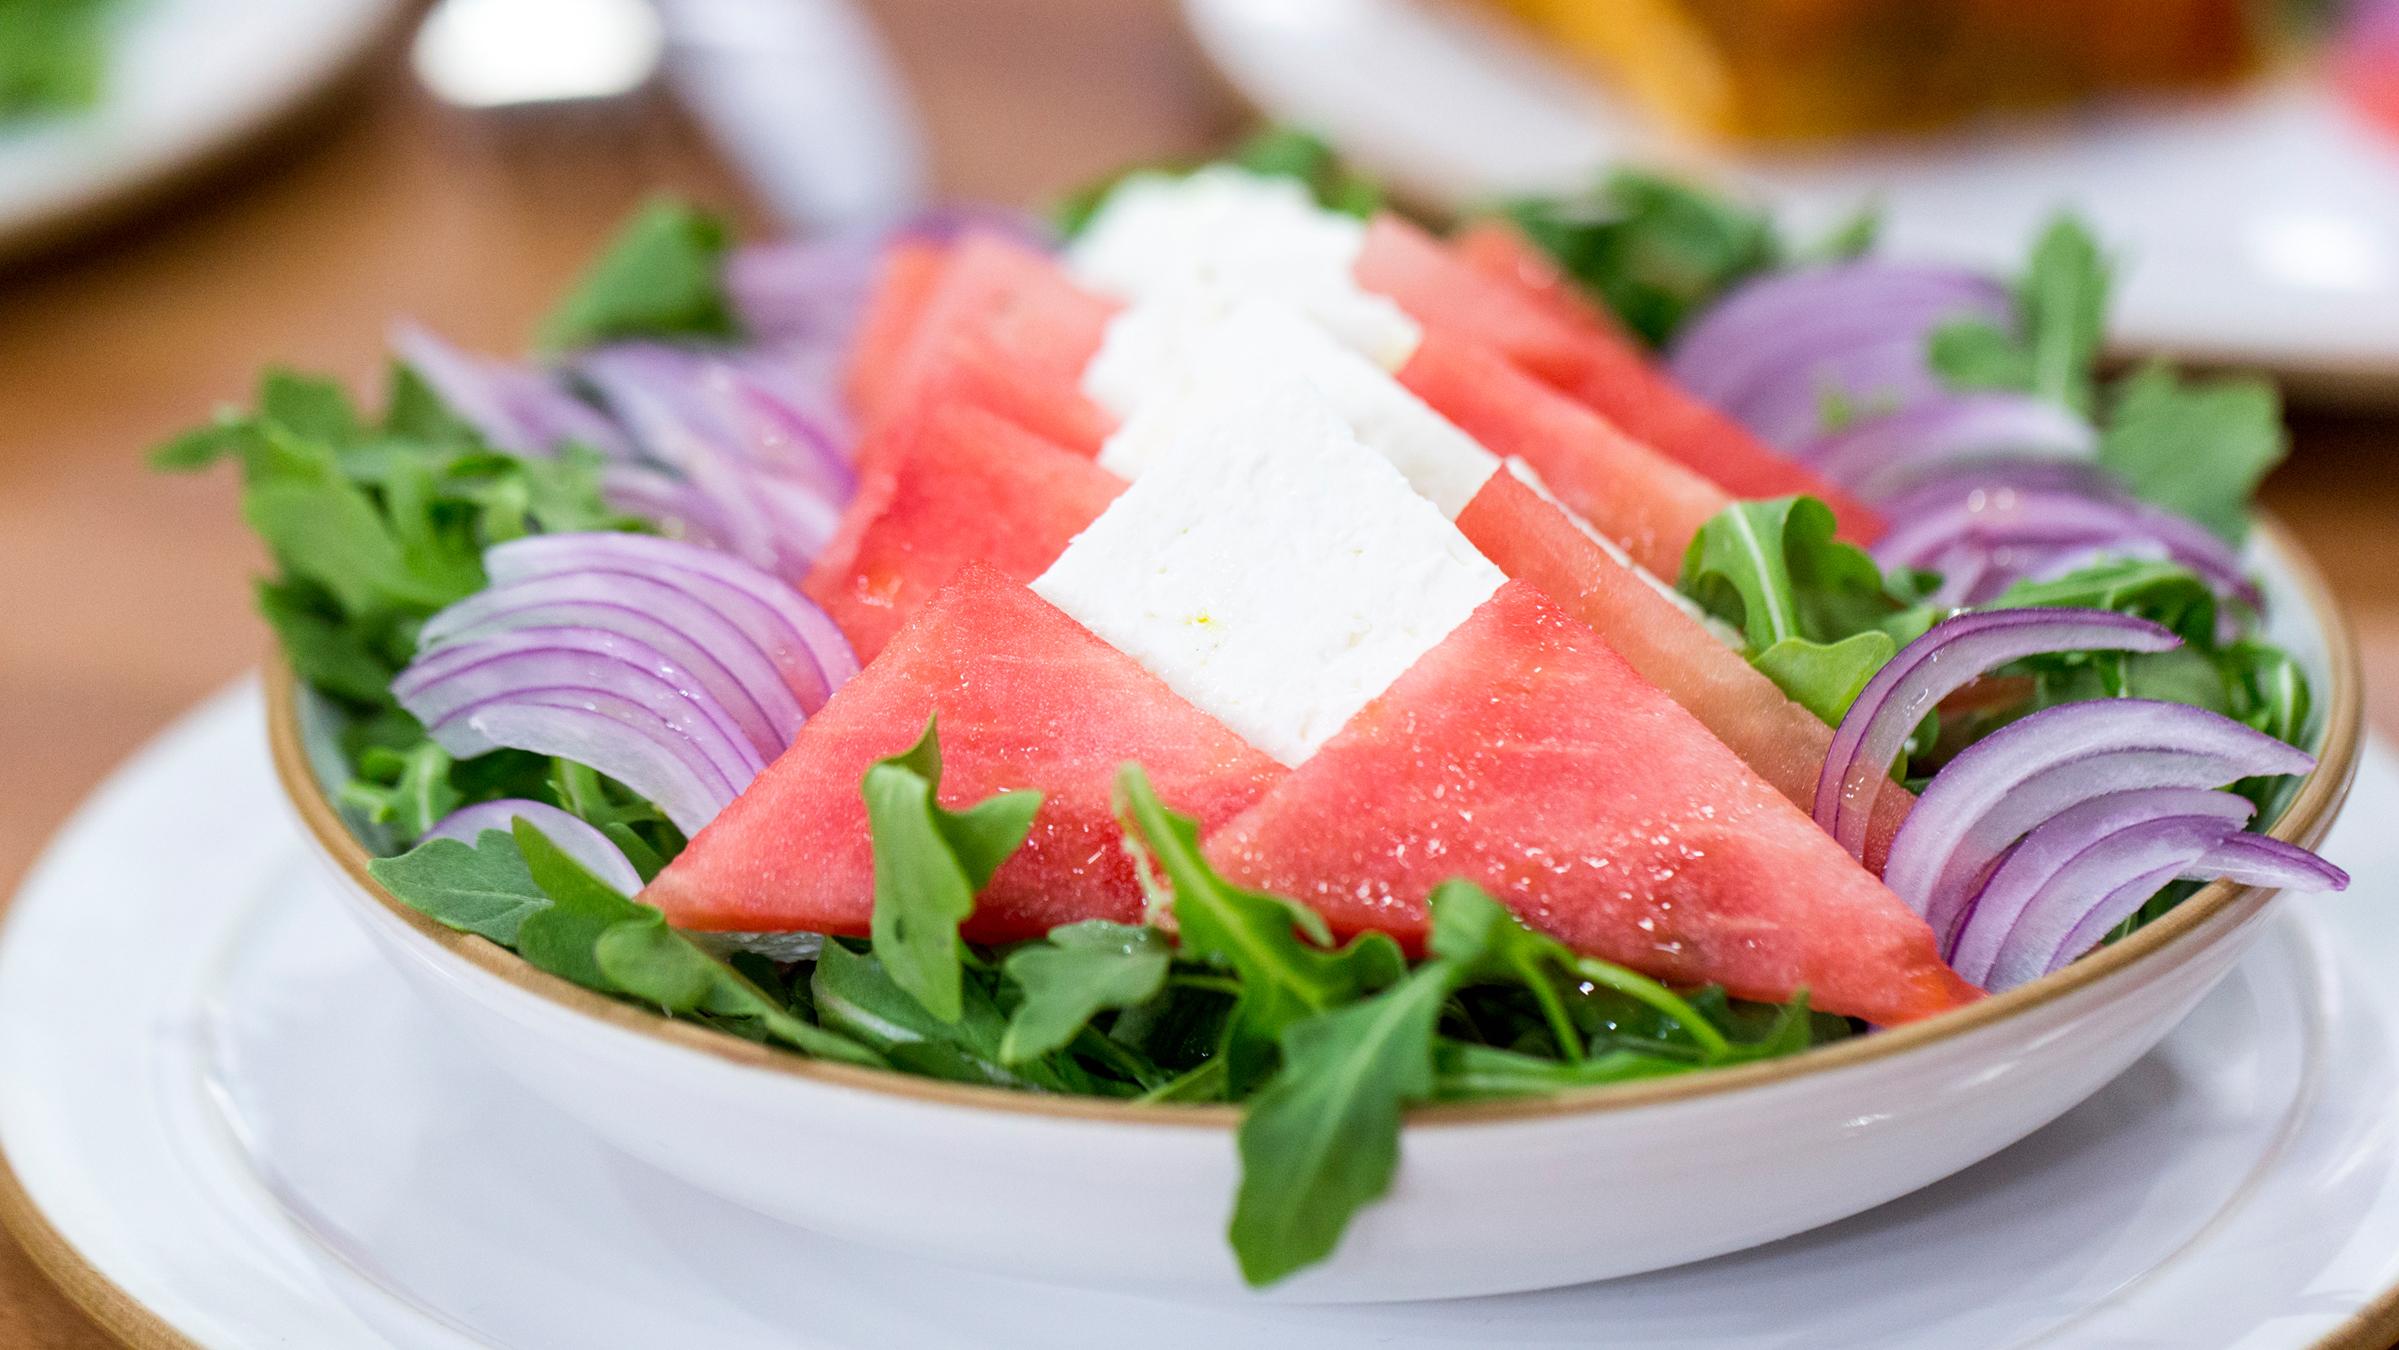 5 ingredient watermelon feta and arugula salad. Black Bedroom Furniture Sets. Home Design Ideas